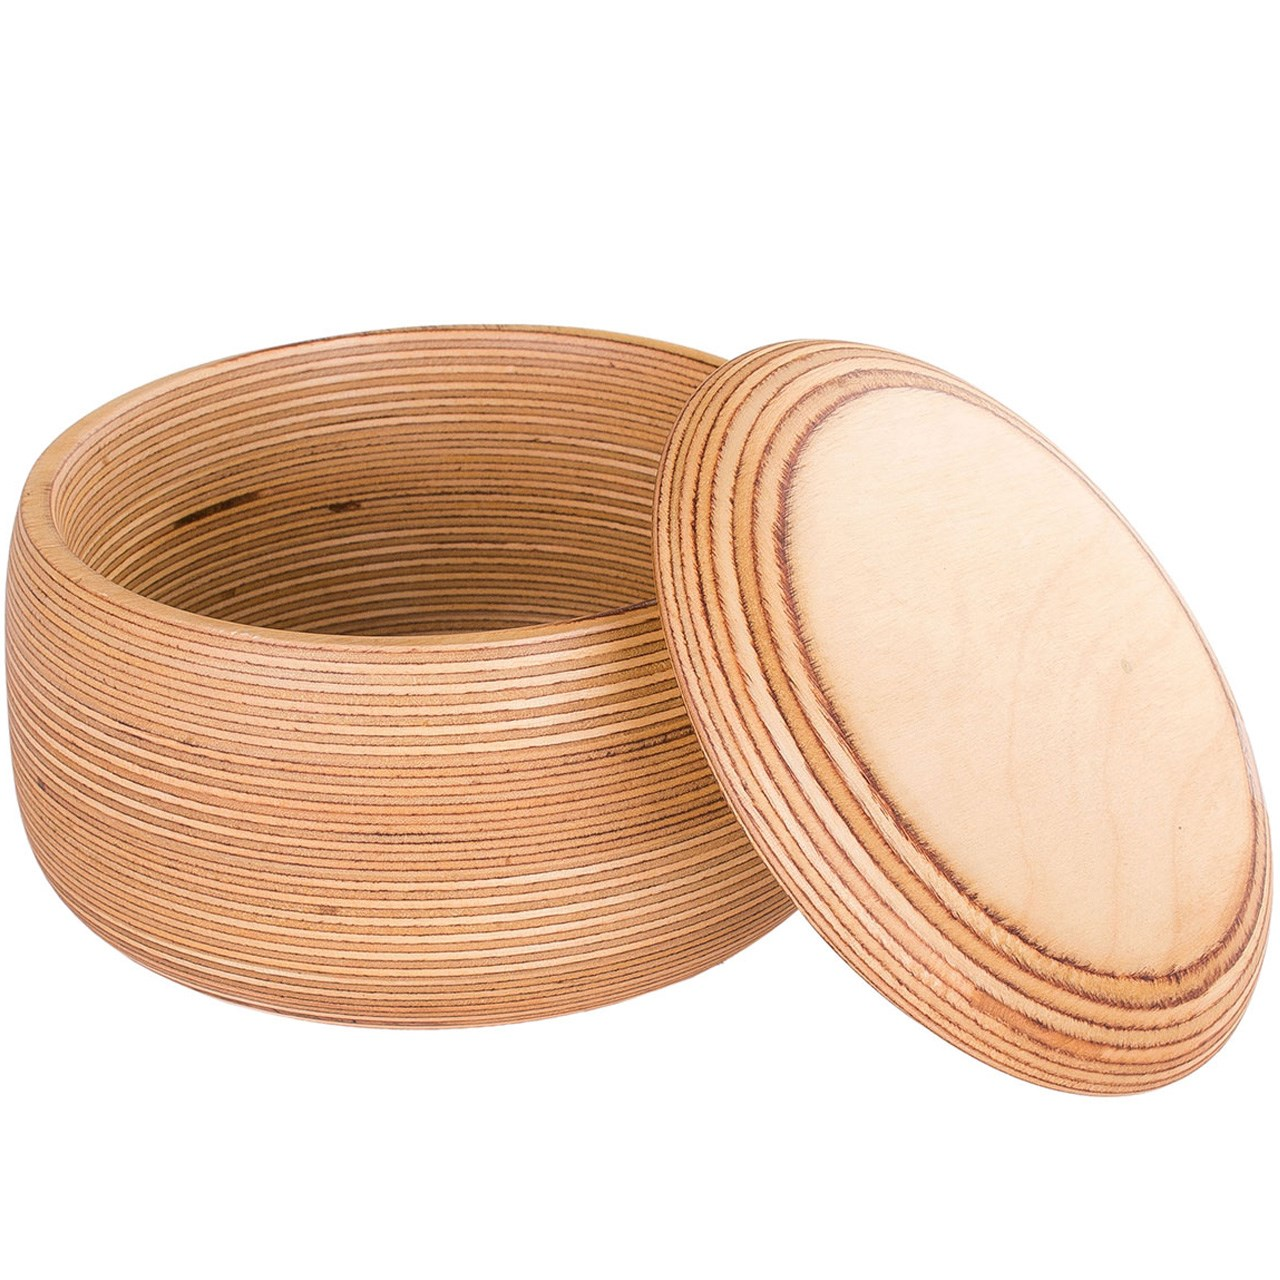 کاسه چوبی کارگاه دکو اکو درپوش دار